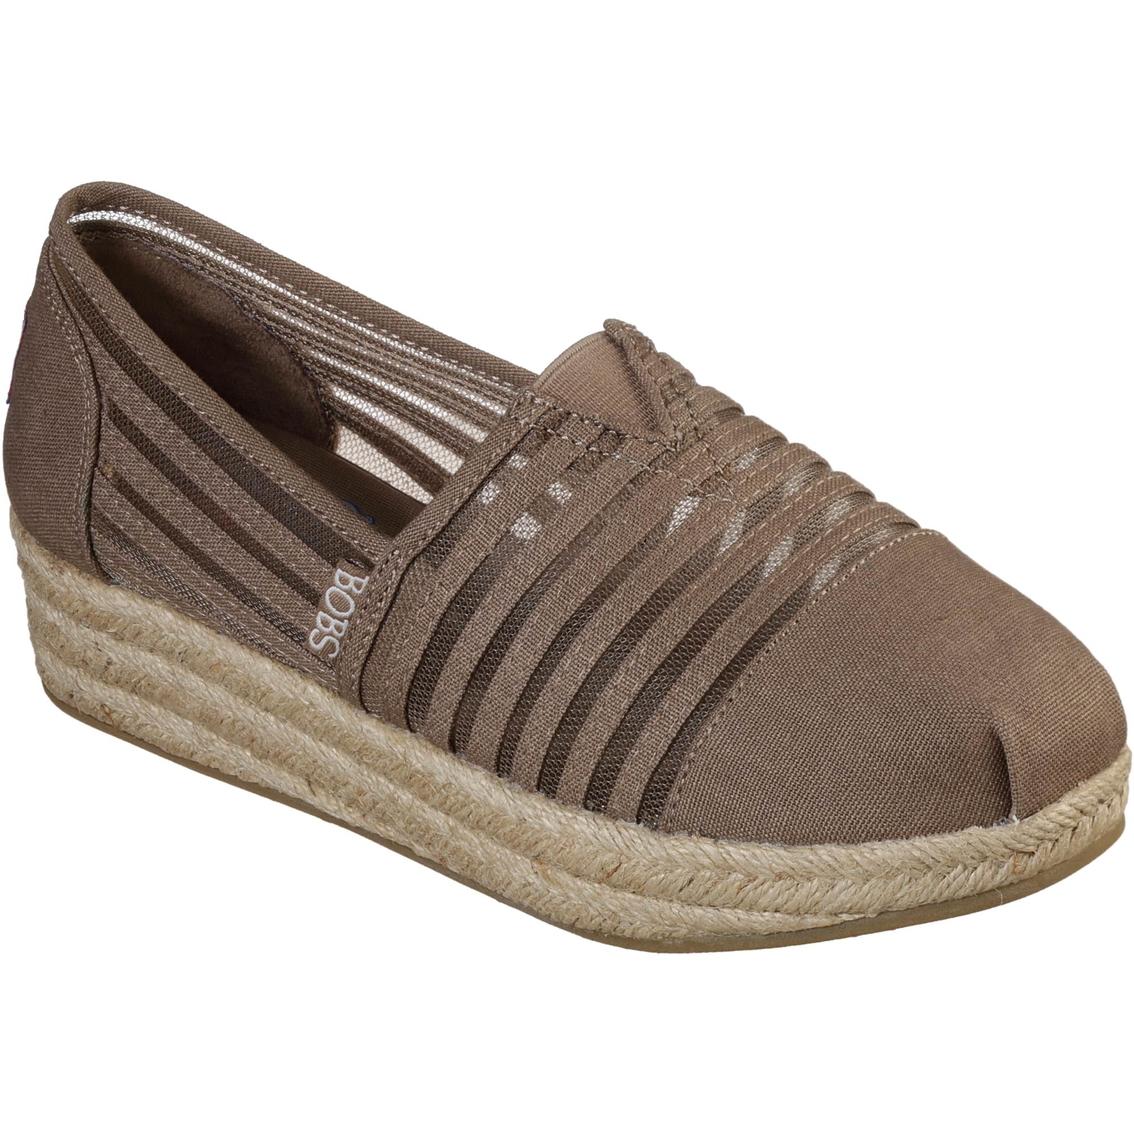 b8a88e01d0eb7 Bobs Women's Highlights Nautical Night Shoes | Wedge | Shoes | Shop ...